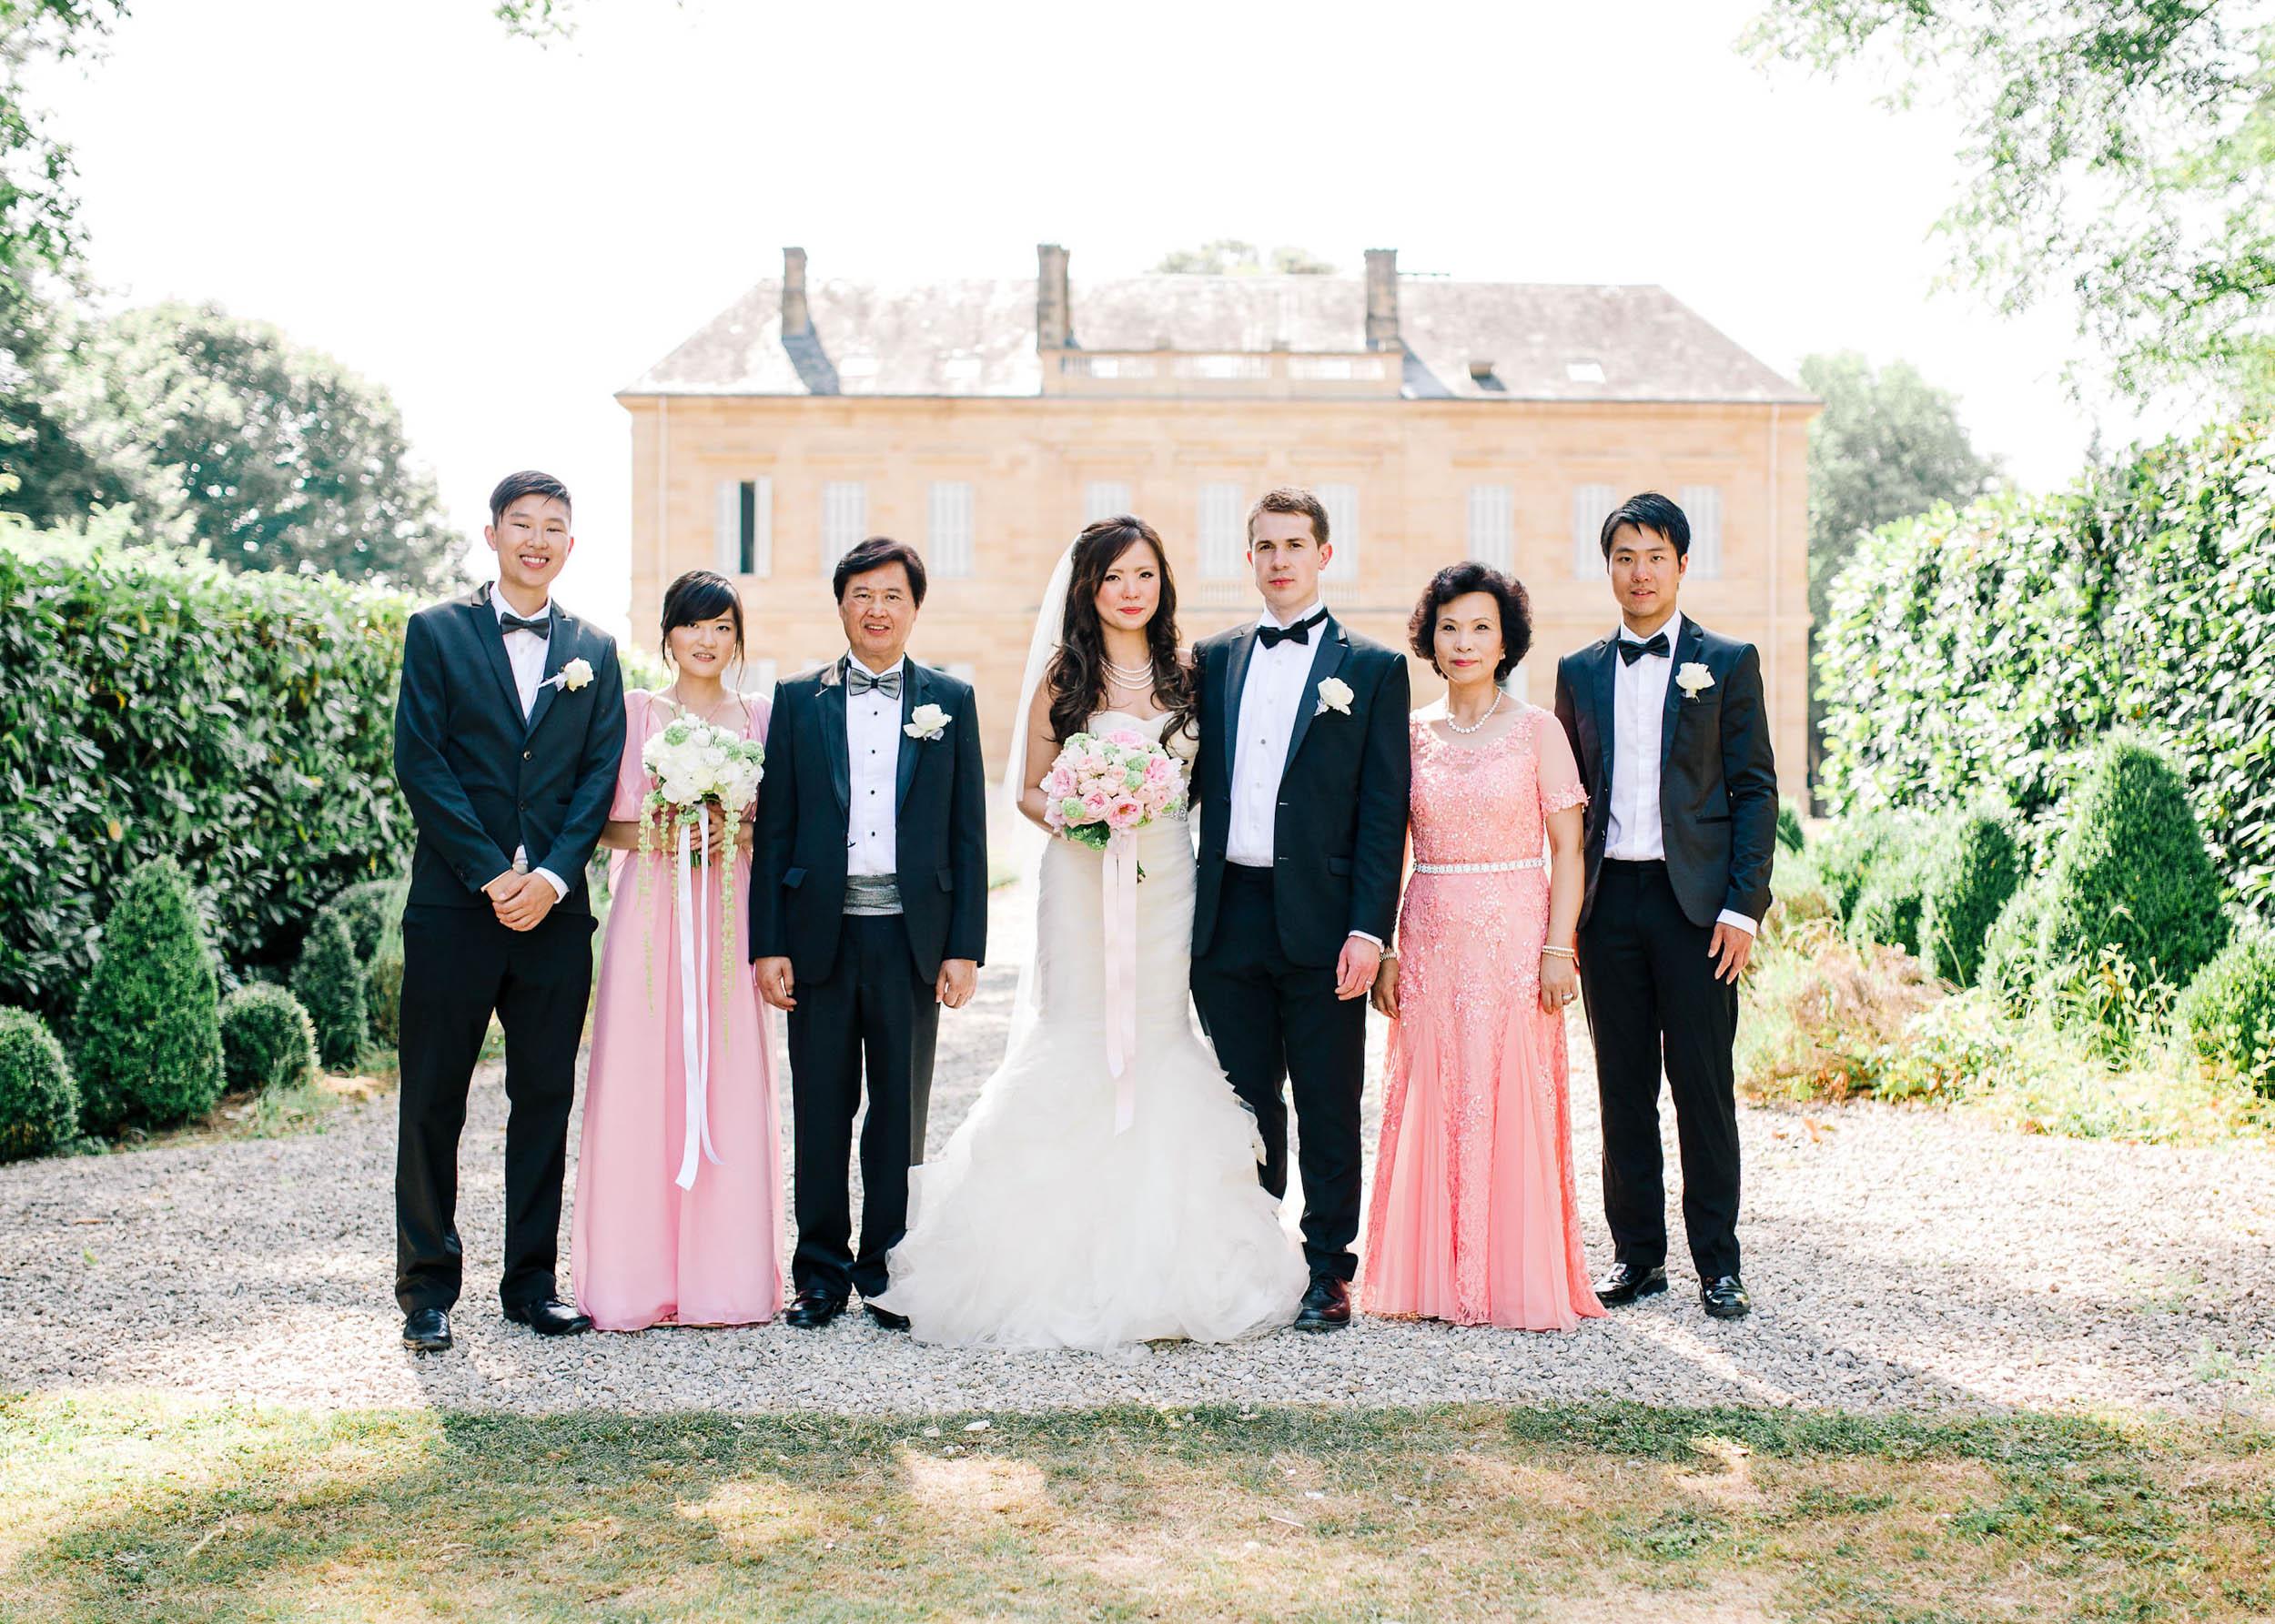 Amy O'Boyle Photography- Destination & UK Fine Art Film Wedding Photographer- Chateau La Durantie Wedding-18.jpg